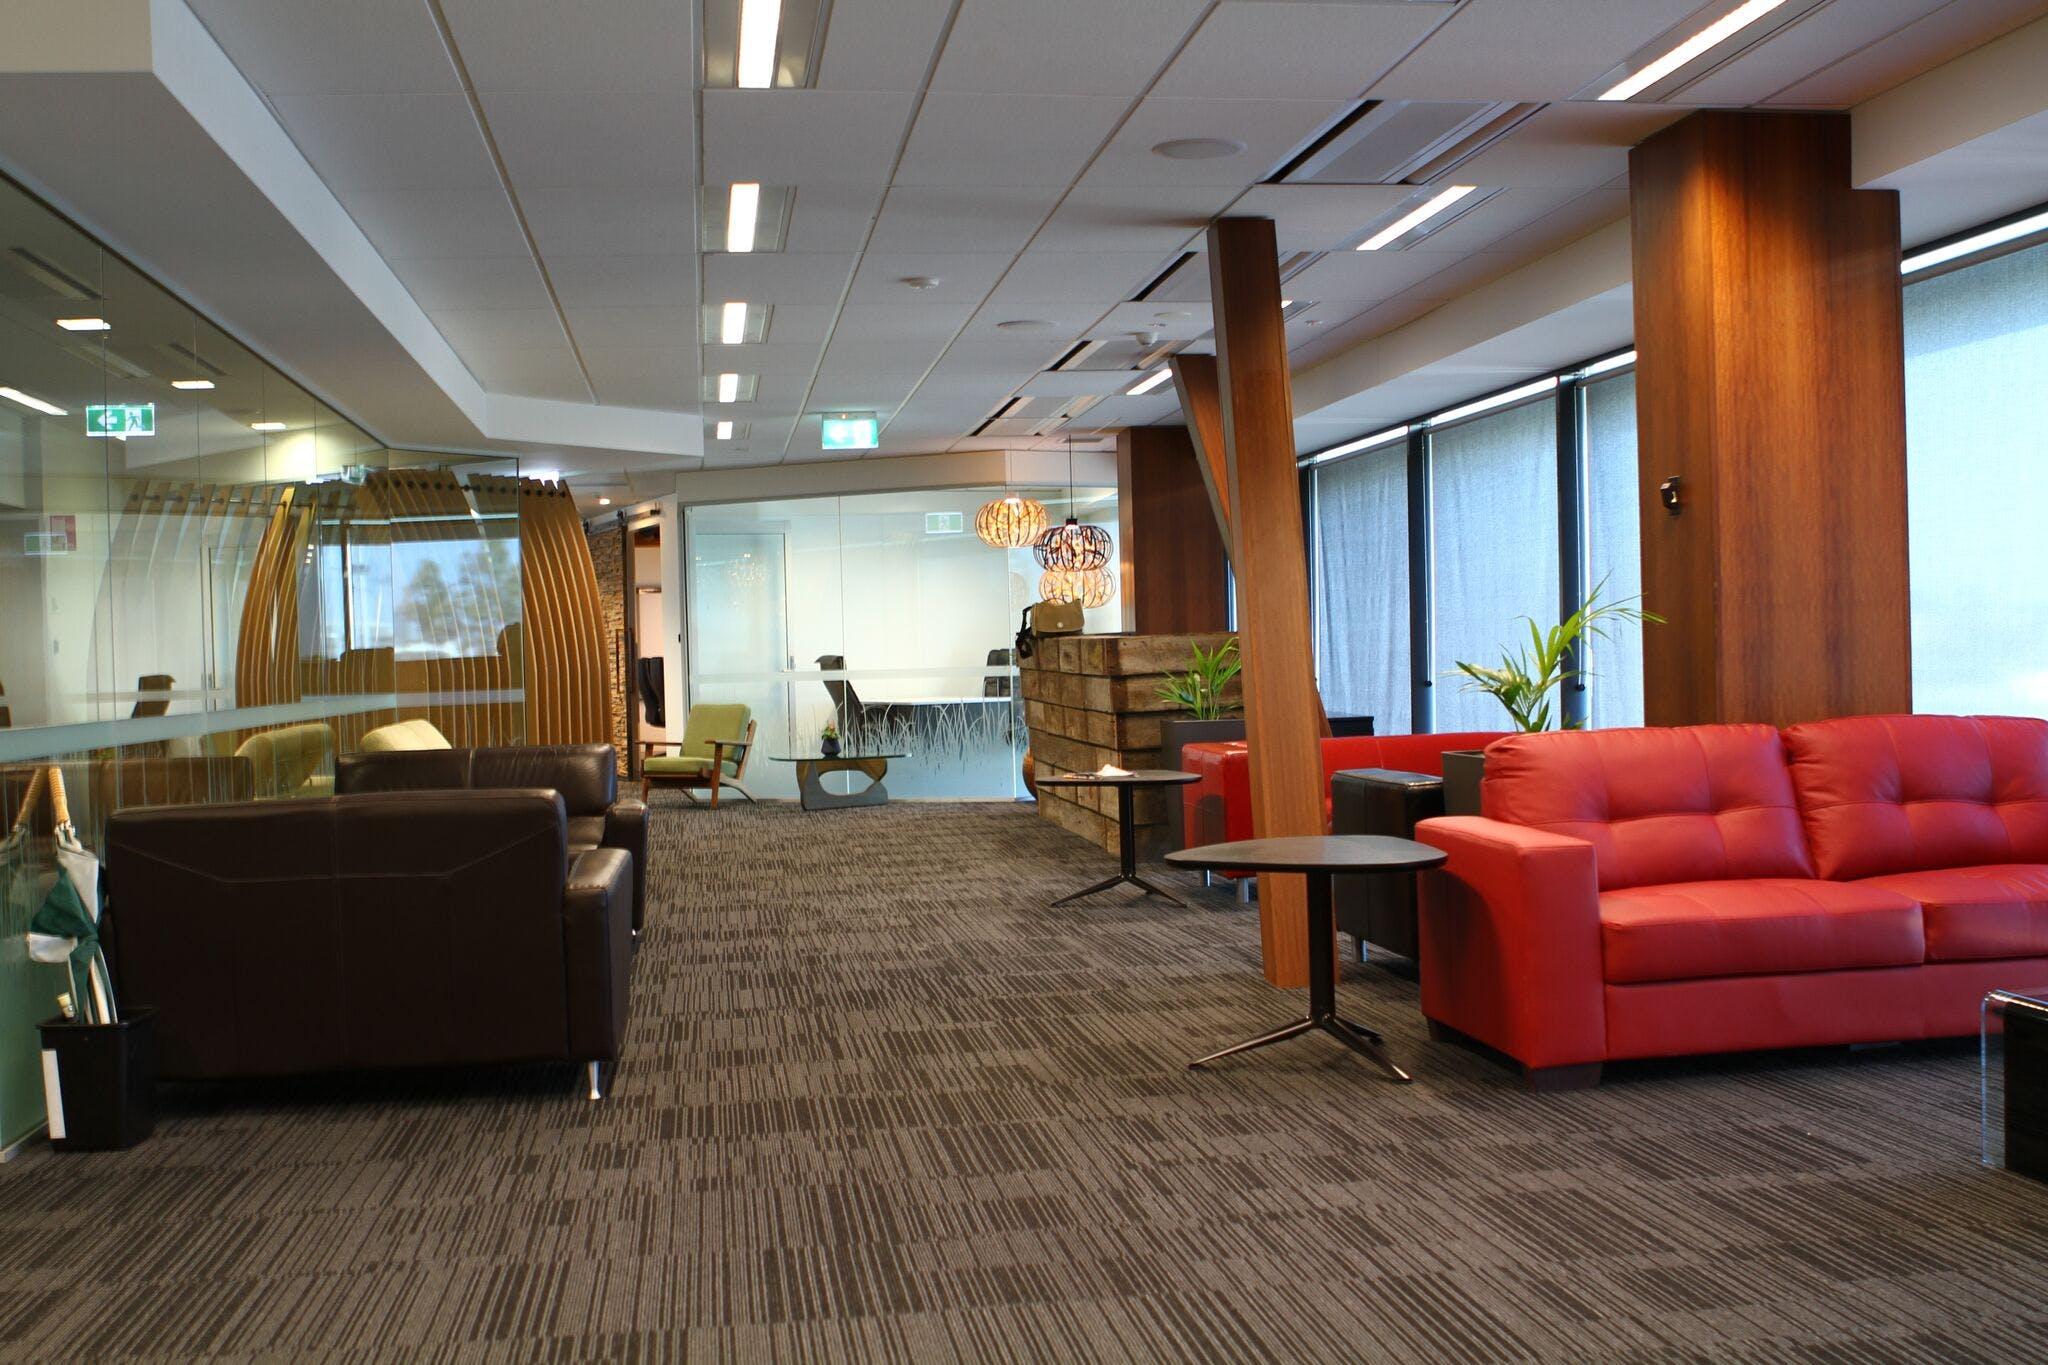 Hot desk at Officenexus, image 3